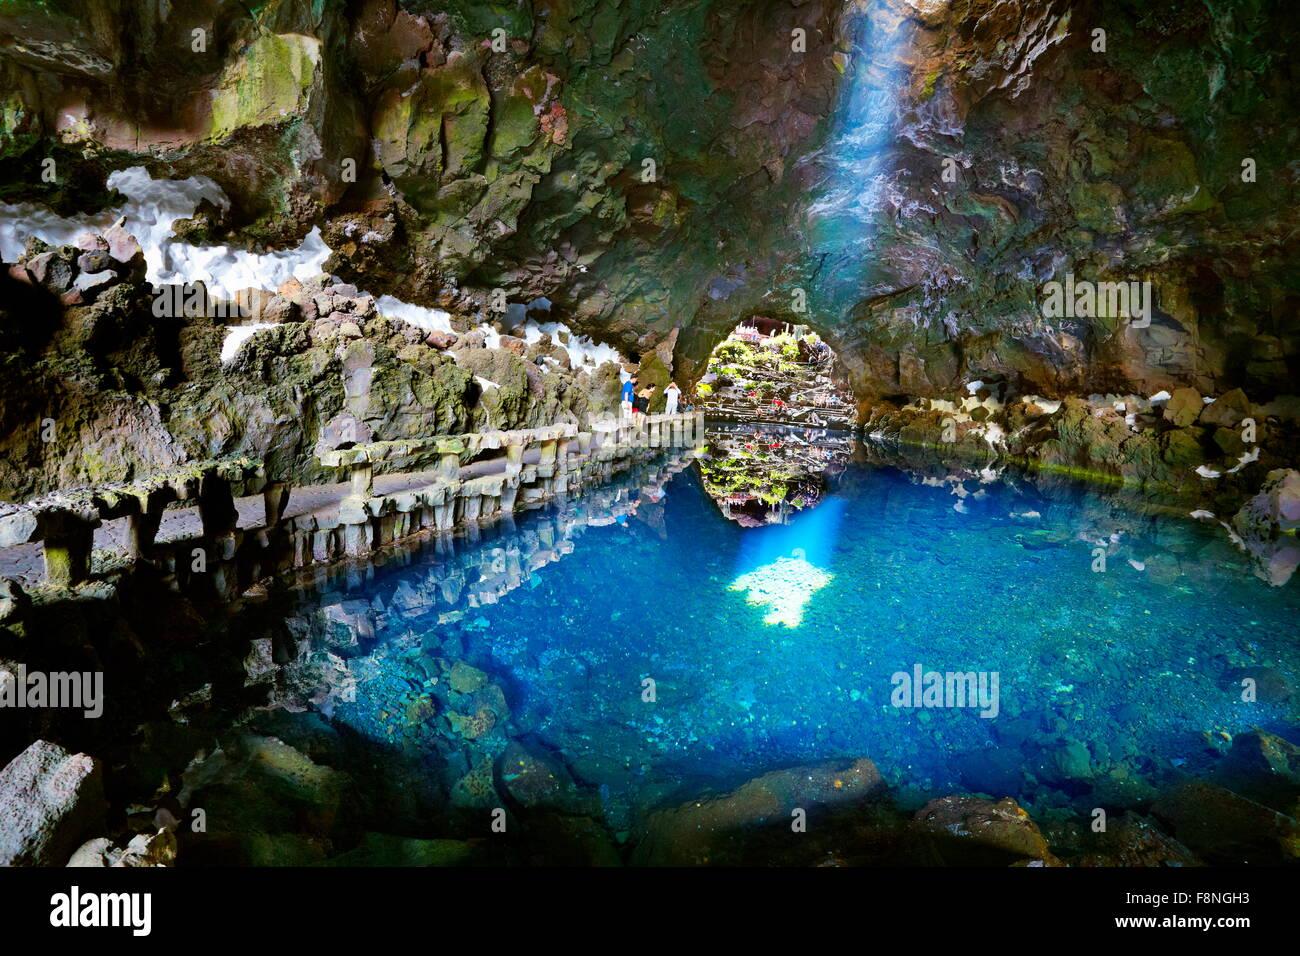 Insel Lanzarote, Jameos del Aqua, See in vulkanischen Höhle, Kanarische Inseln, Spanien Stockbild